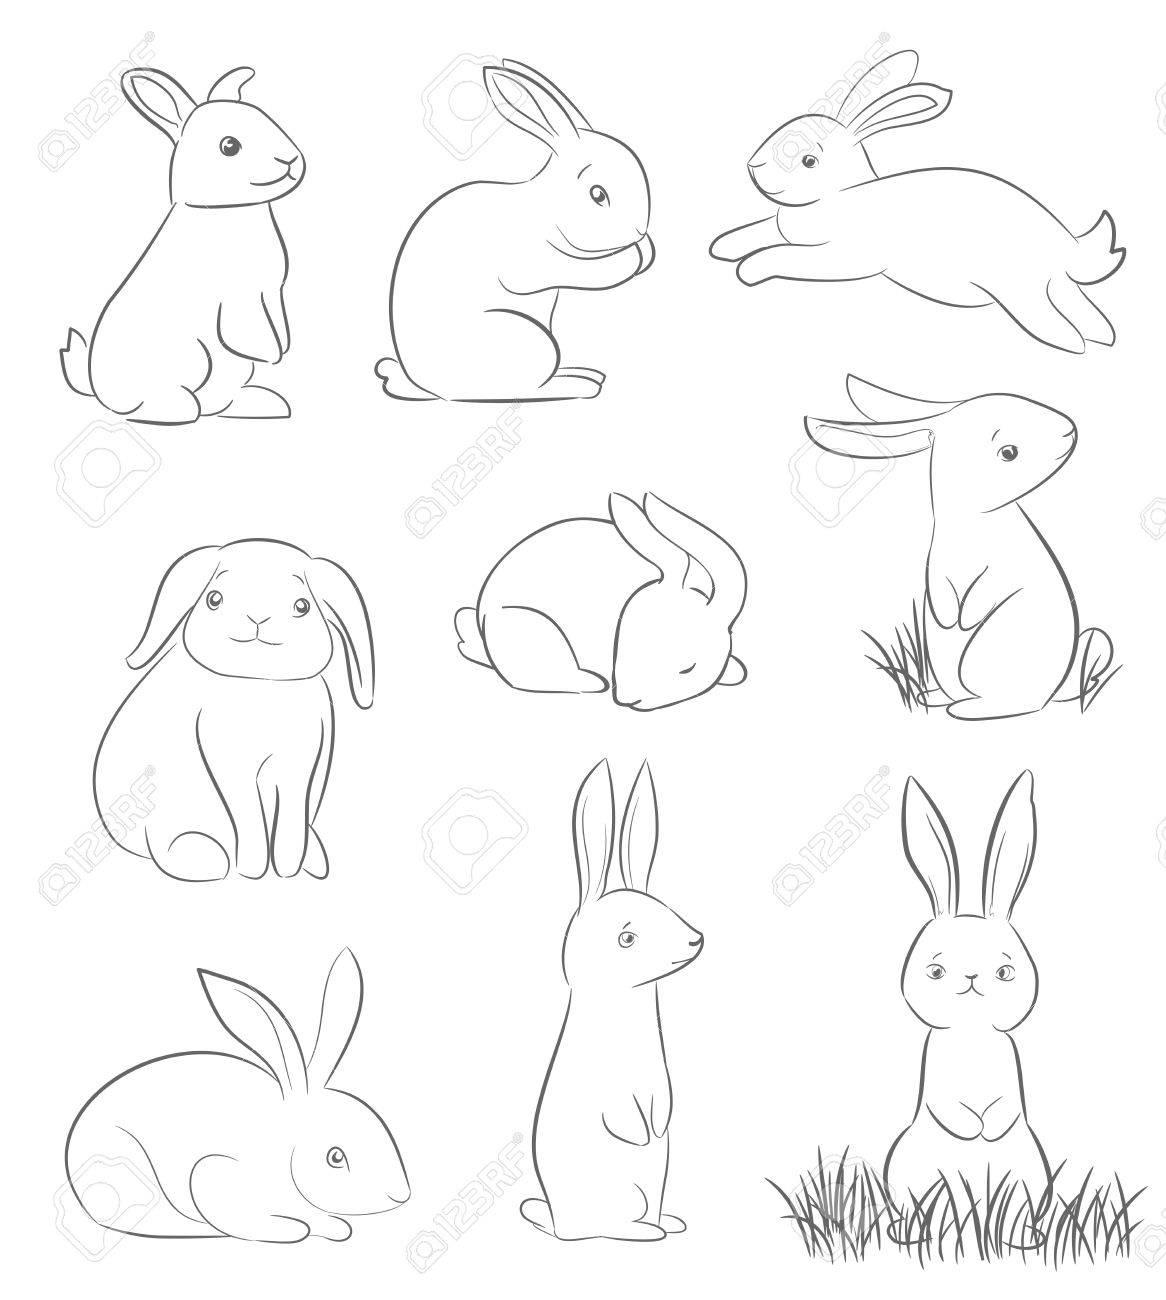 1166x1300 Set Of Cute Cartoon Rabbits. Line Art Vector Drawing Royalty Free